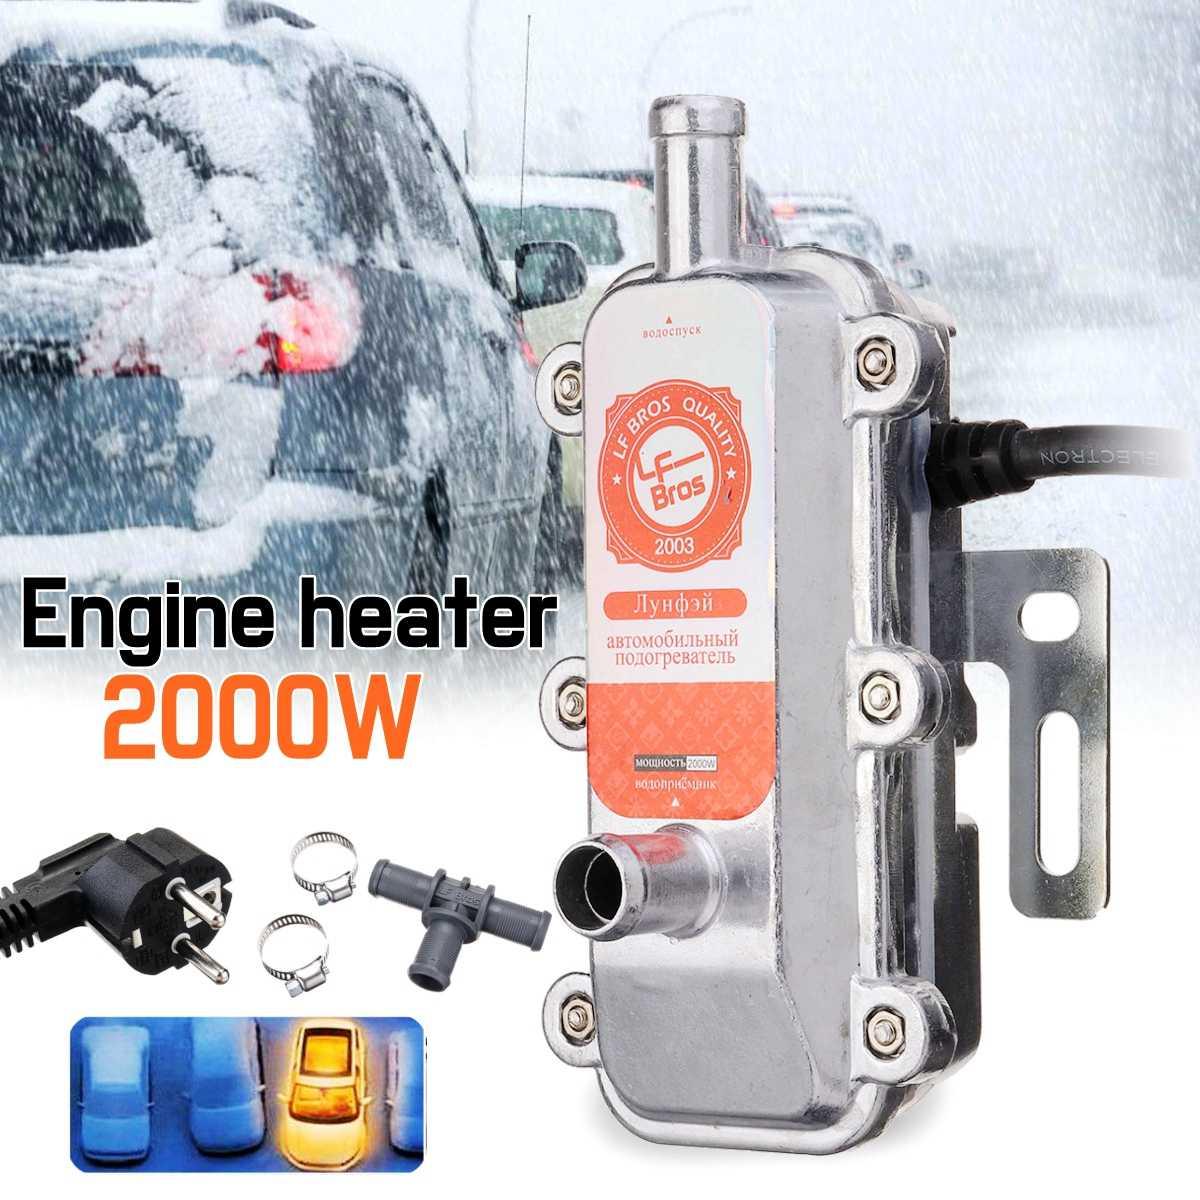 Heater Motor-Caravan Car-Engine 2000W 220V Not-Web-Asto For Eberspacher Newest